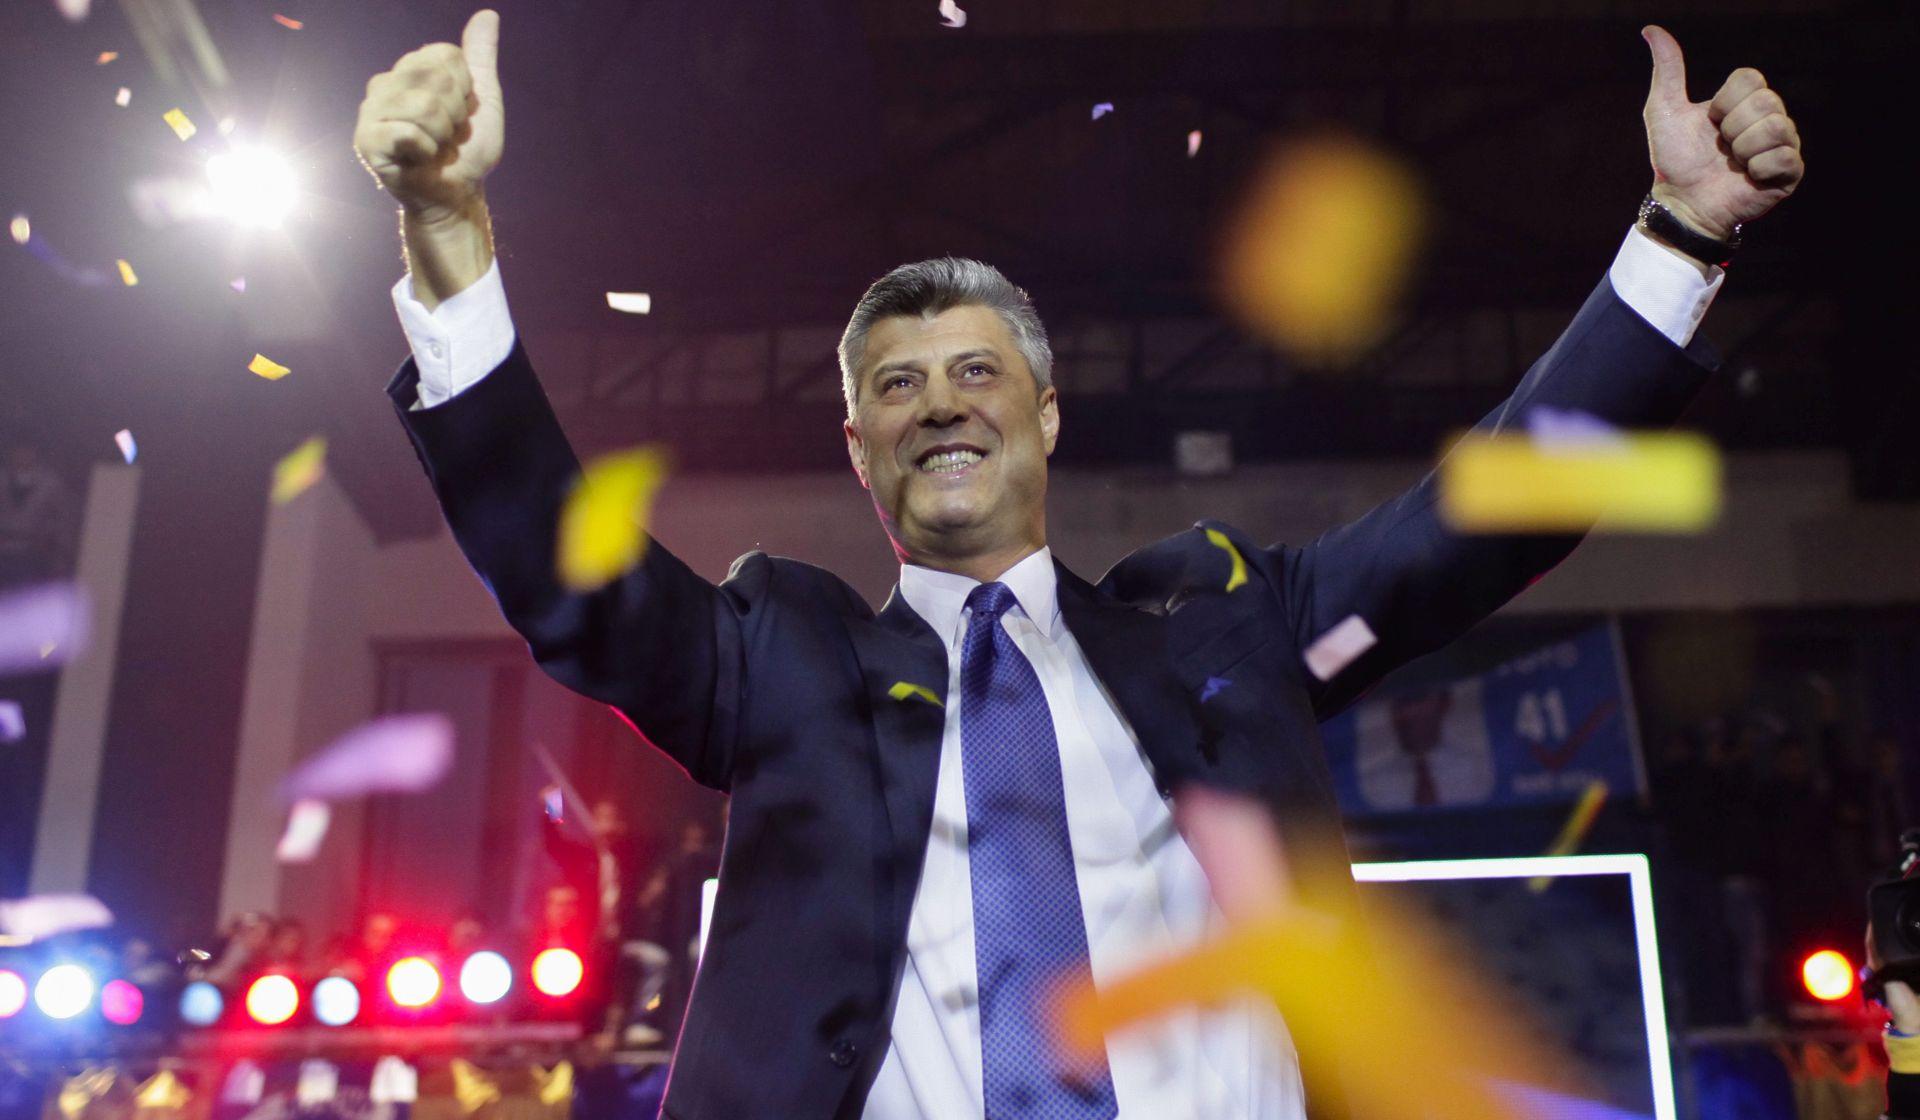 NAKON TRI KRUGA GLASOVANJA: Hashim Thaci izabran za predsjednika Kosova